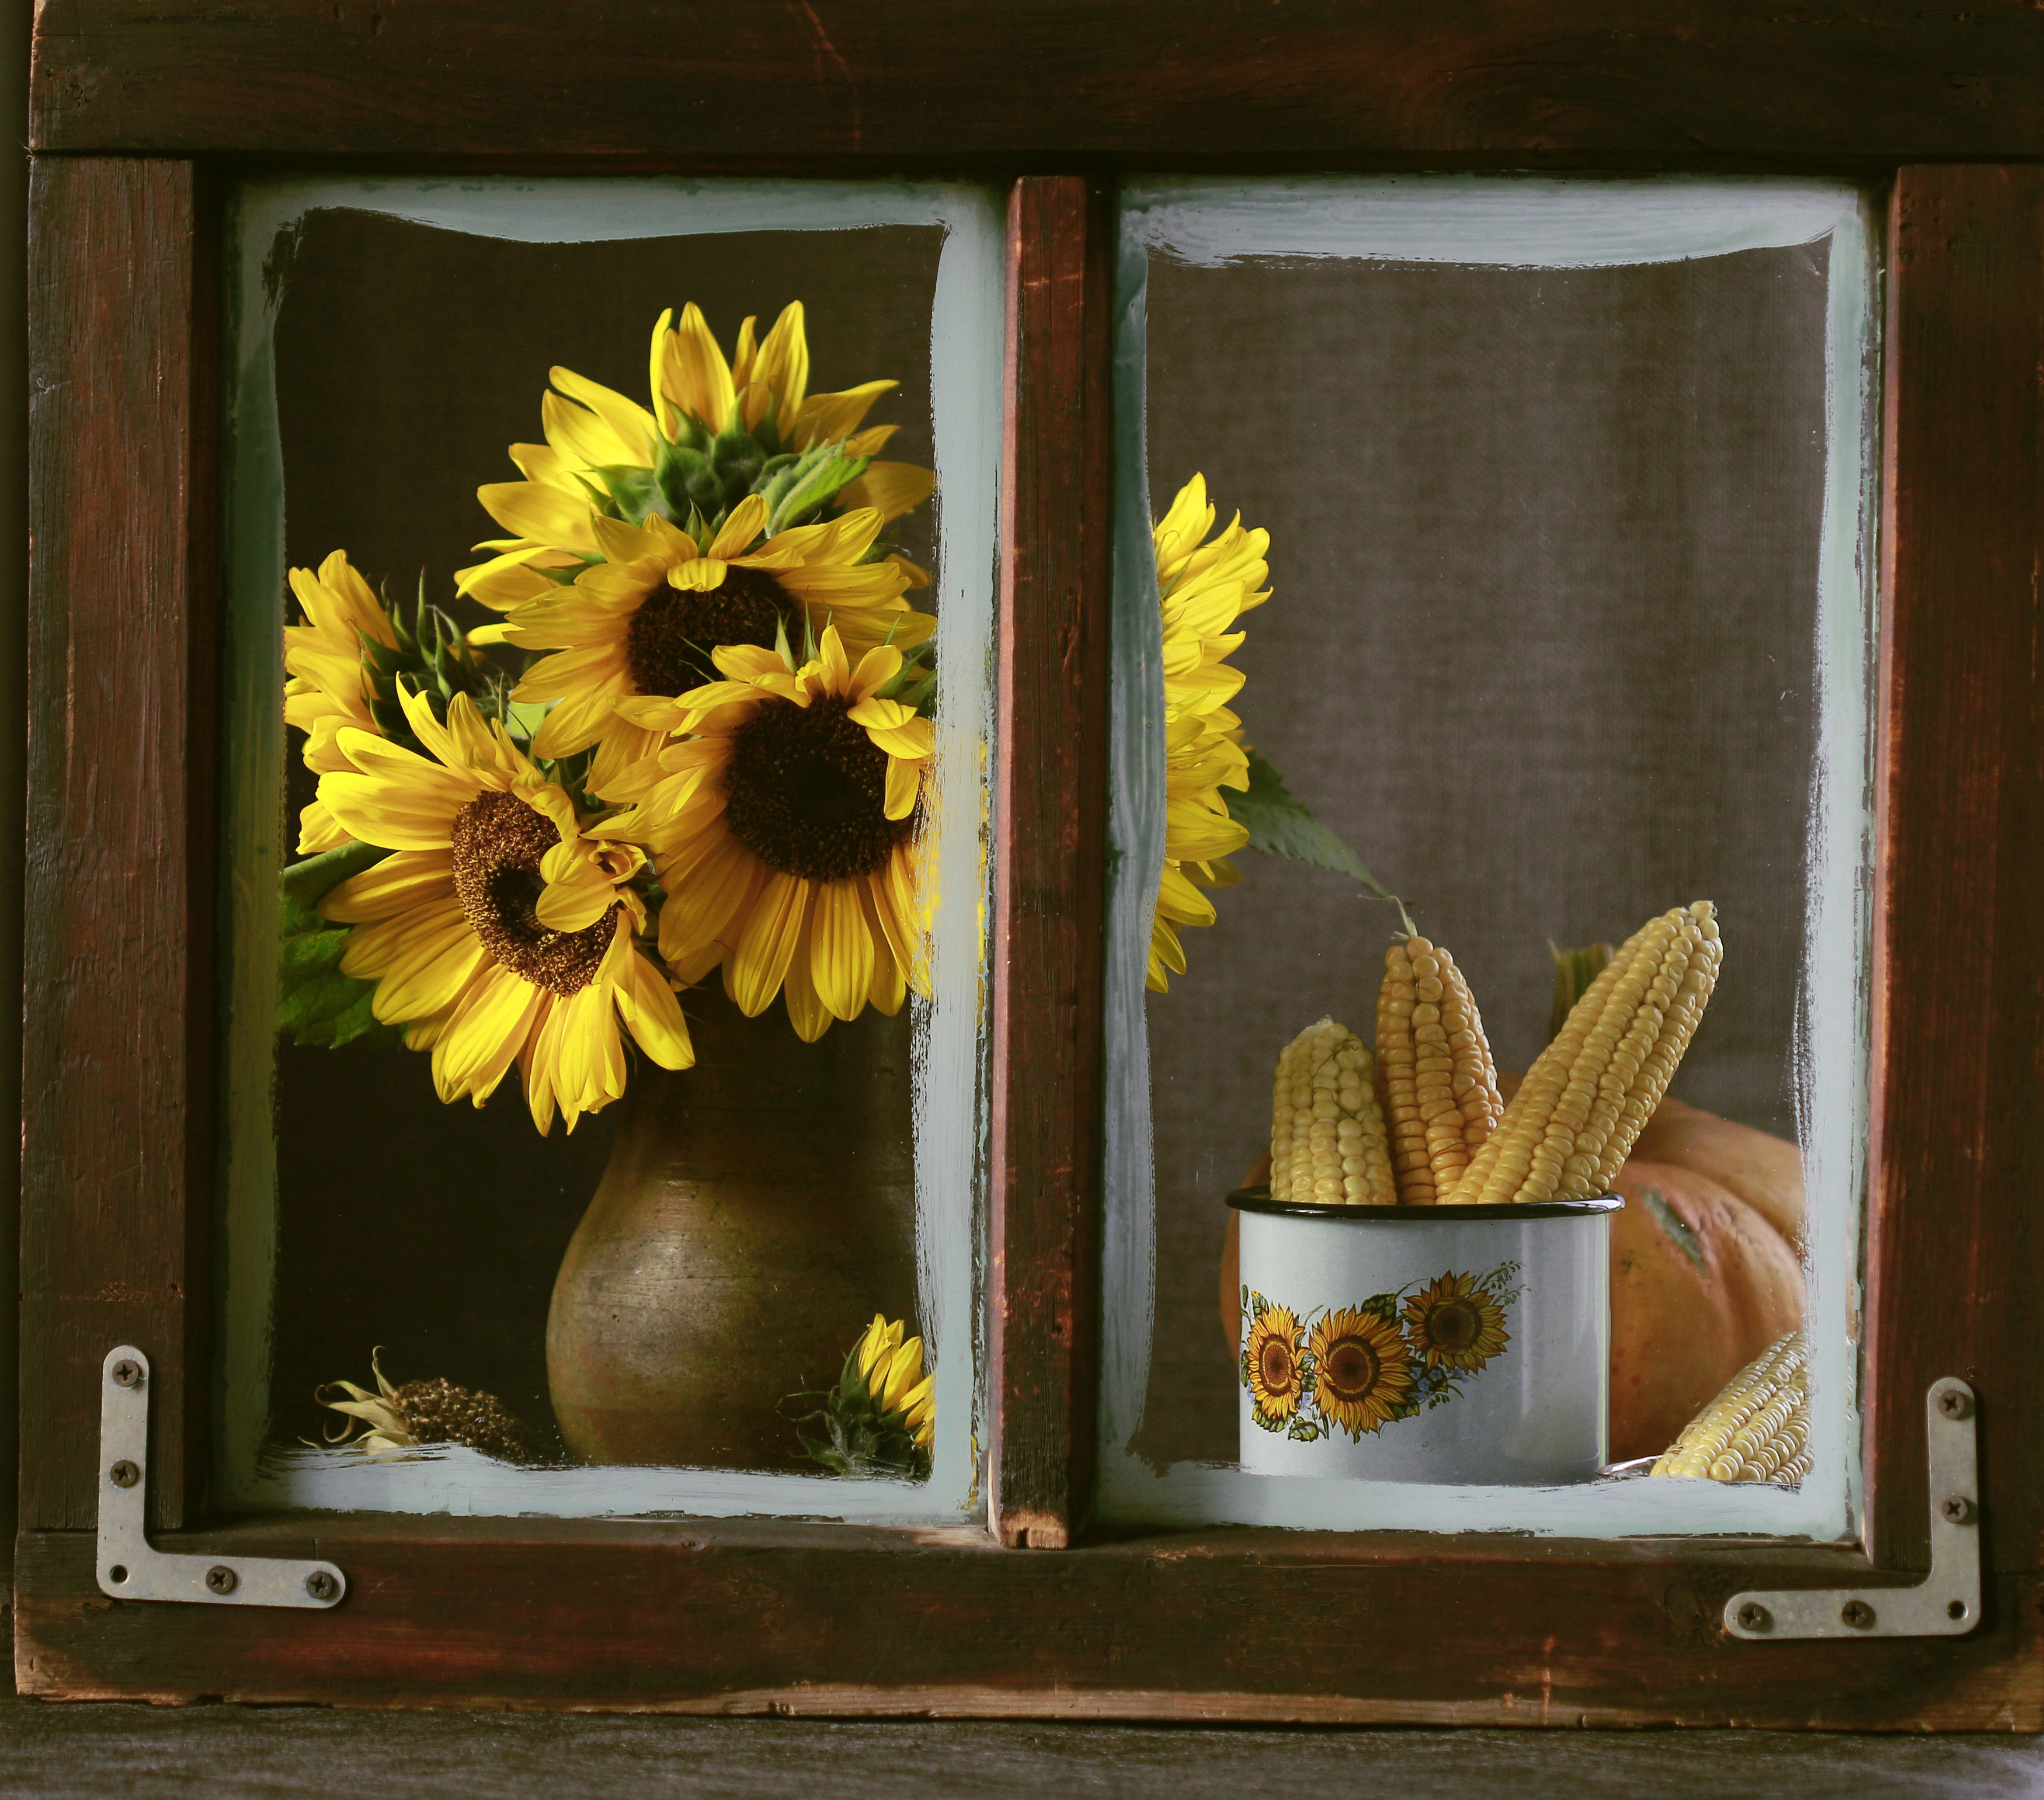 натюрморт, фотонатюрморт, окно, осень, кукуруза, подсолнухи, наталья казанцева, Казанцева Наталья